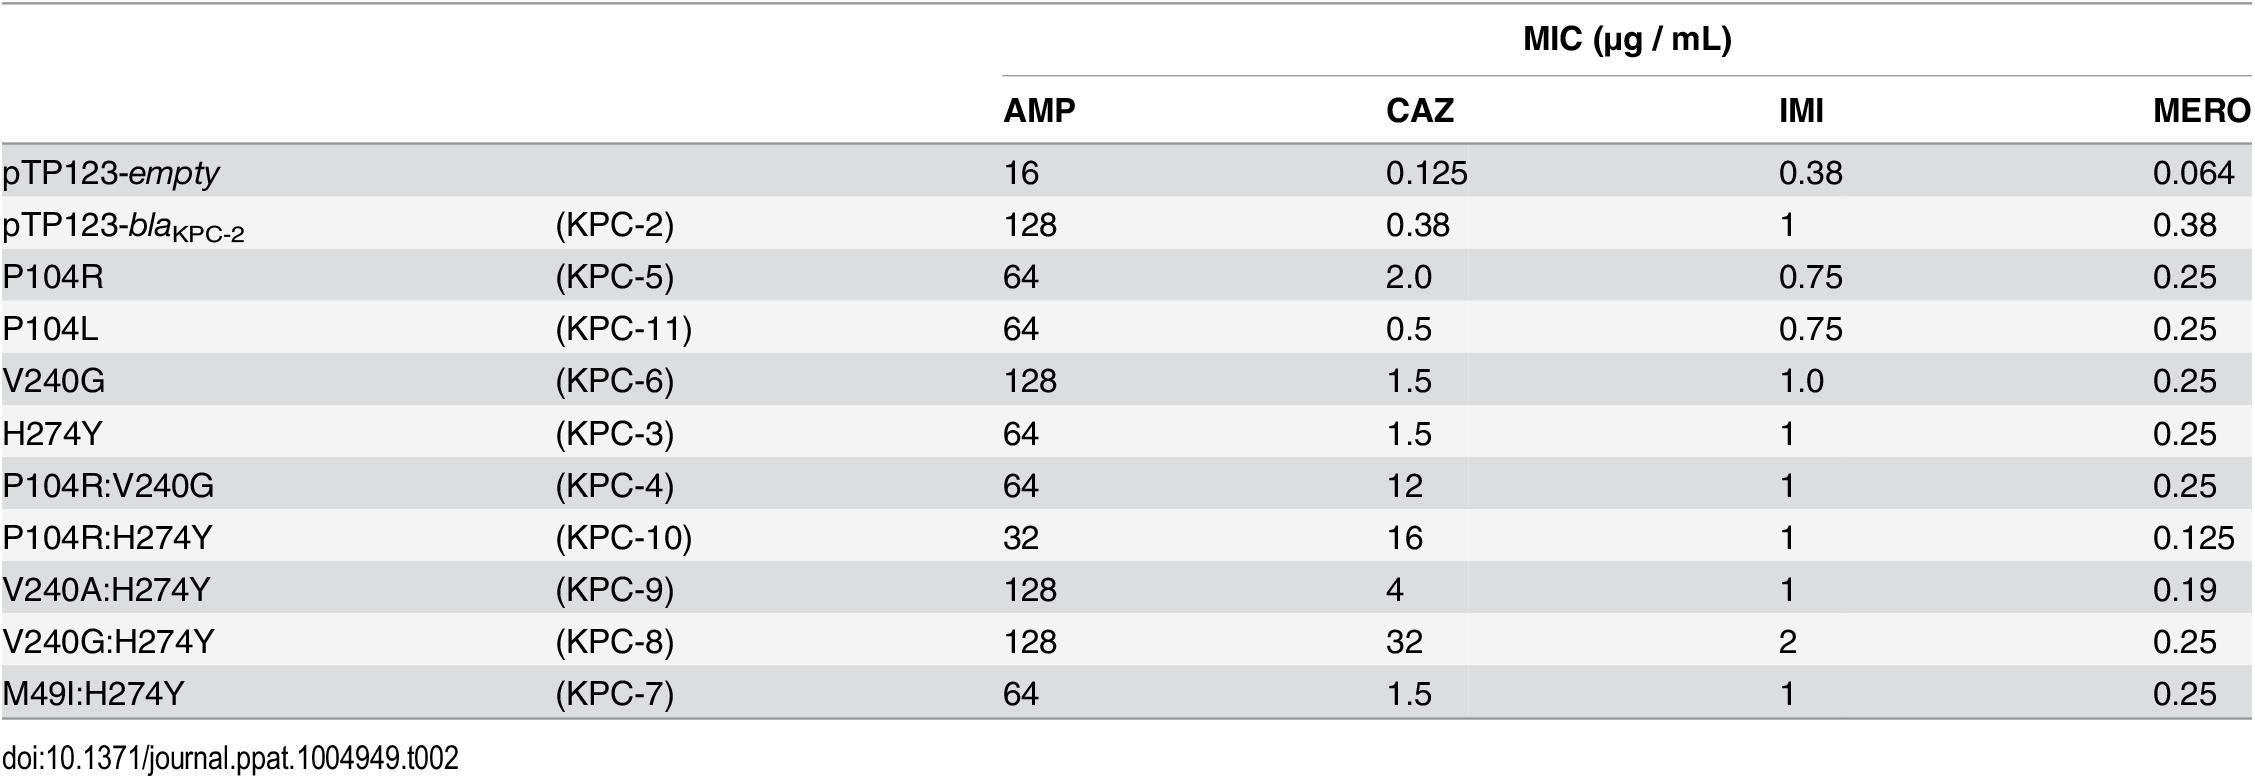 Minimum inhibitory concentrations (MIC's) of antibiotics for KPC variants.